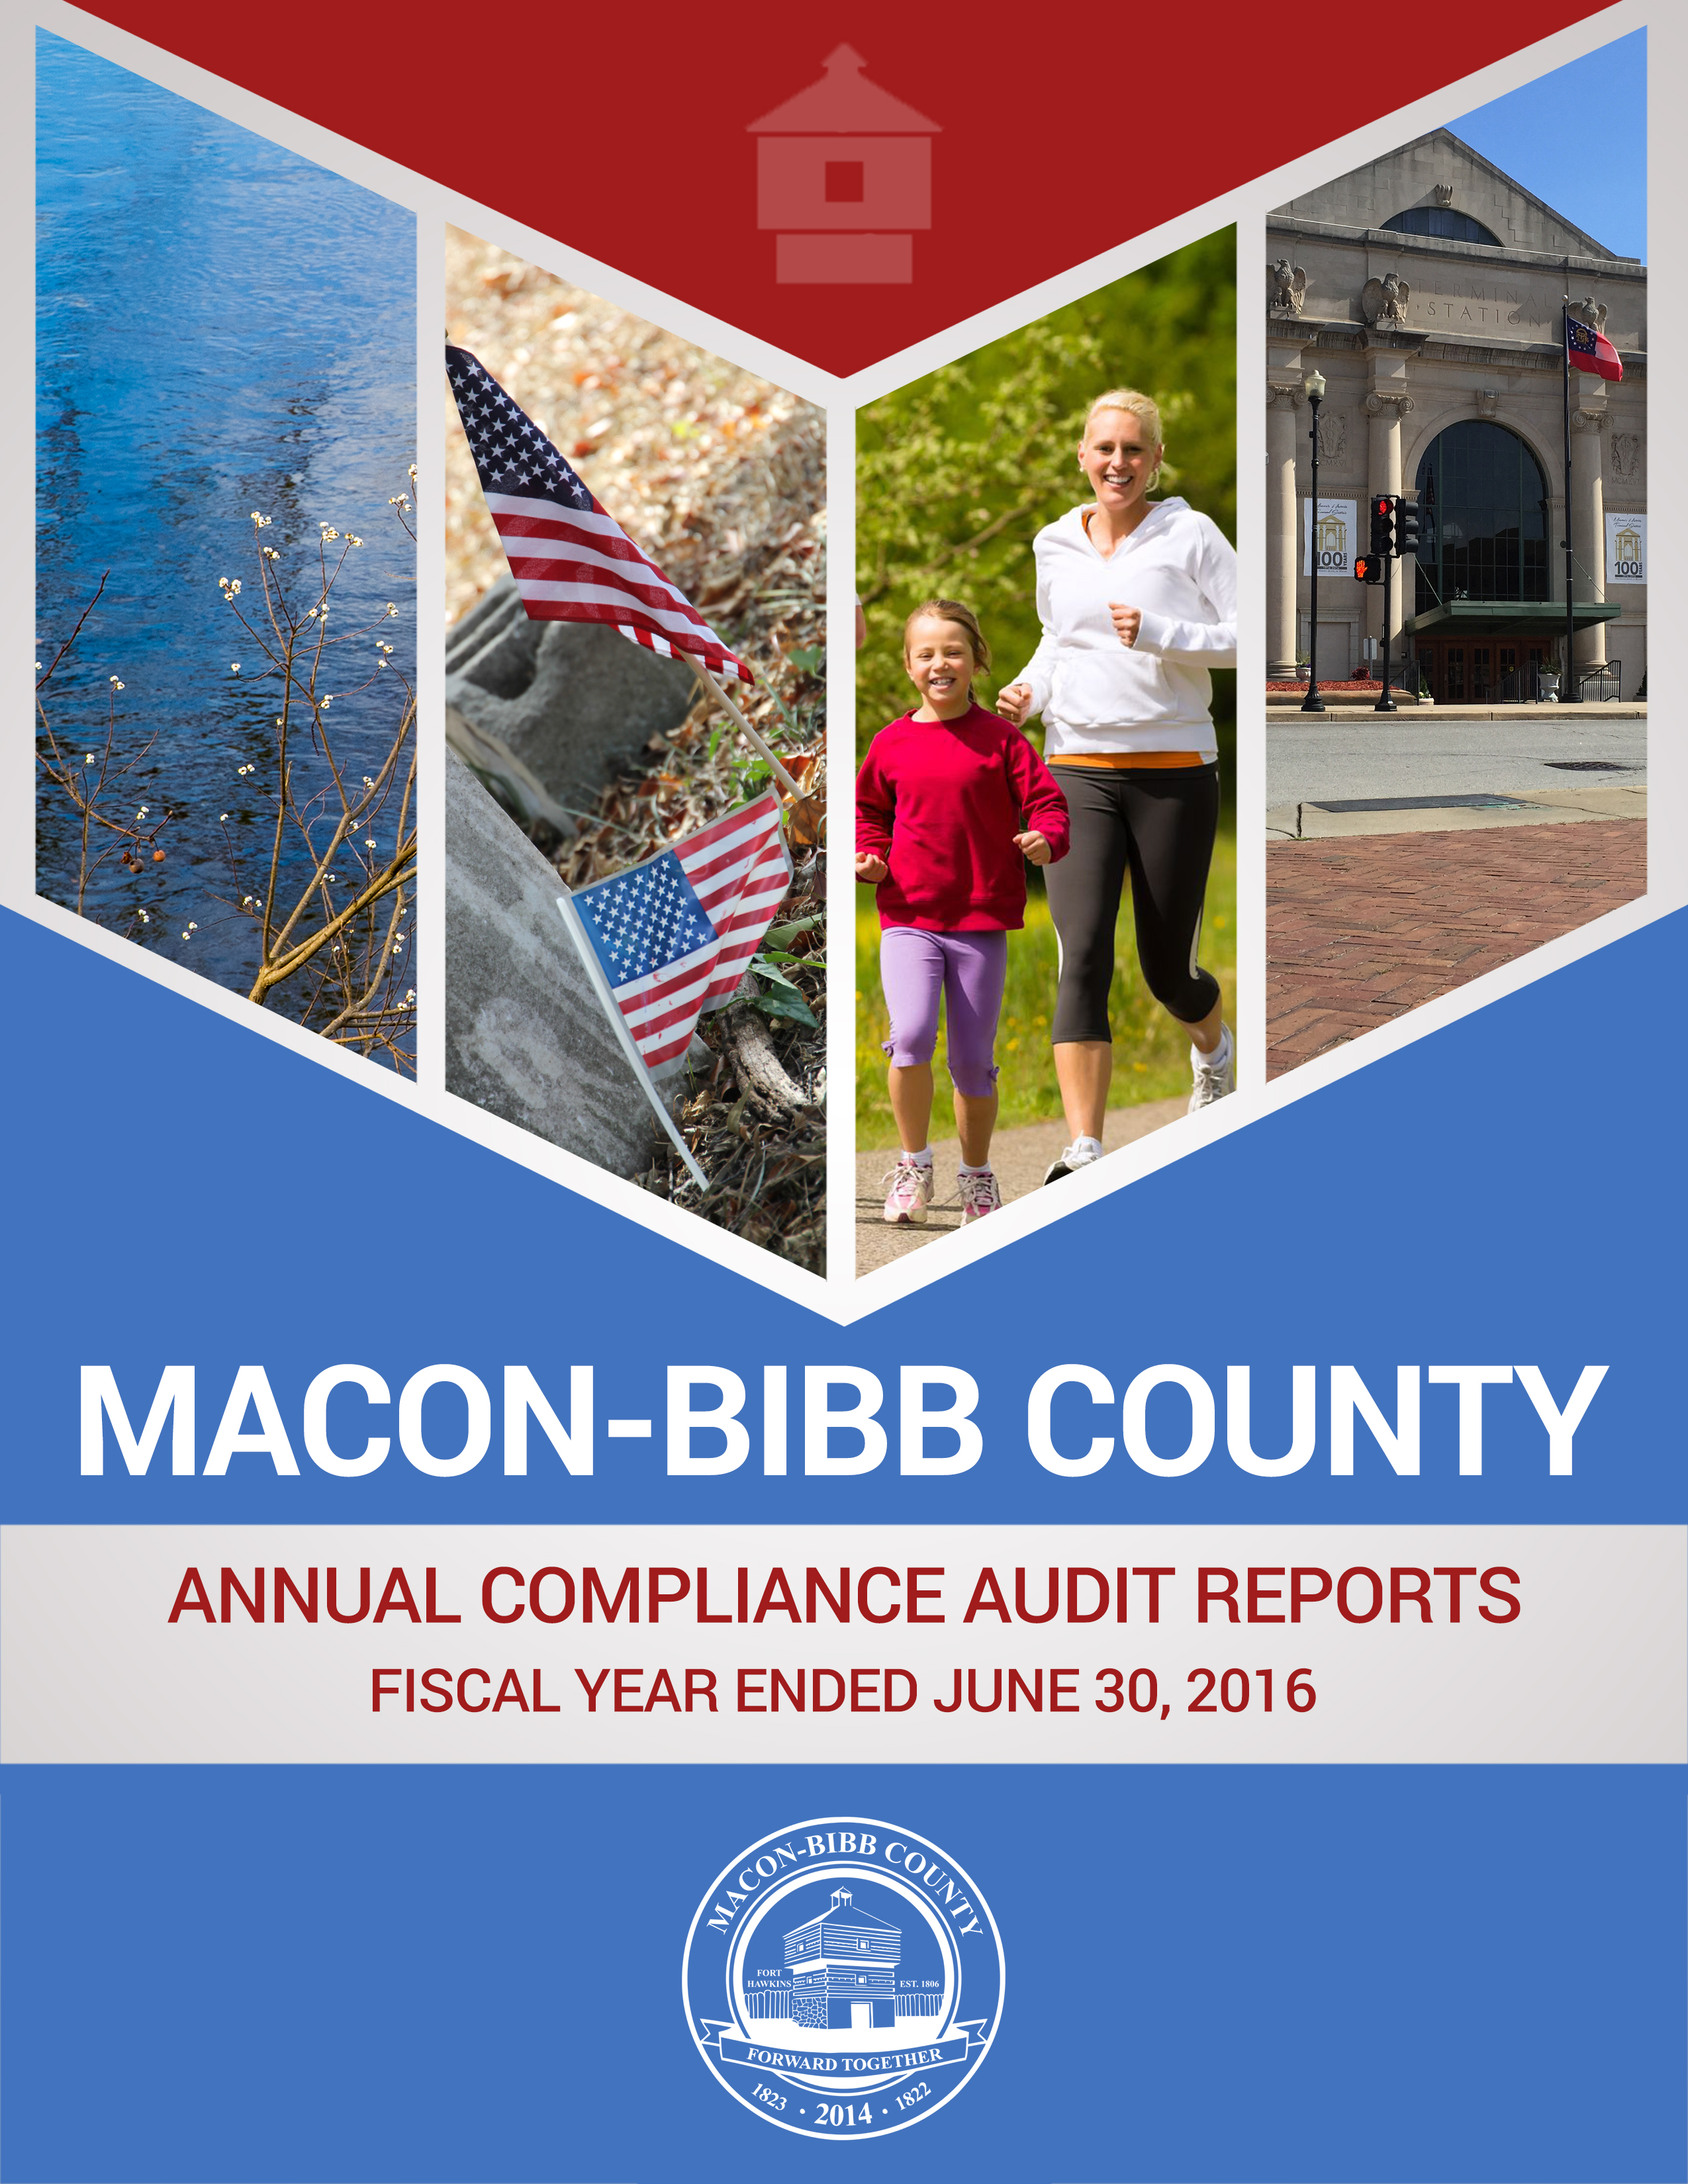 Commissioners | Macon-Bibb County, Georgia